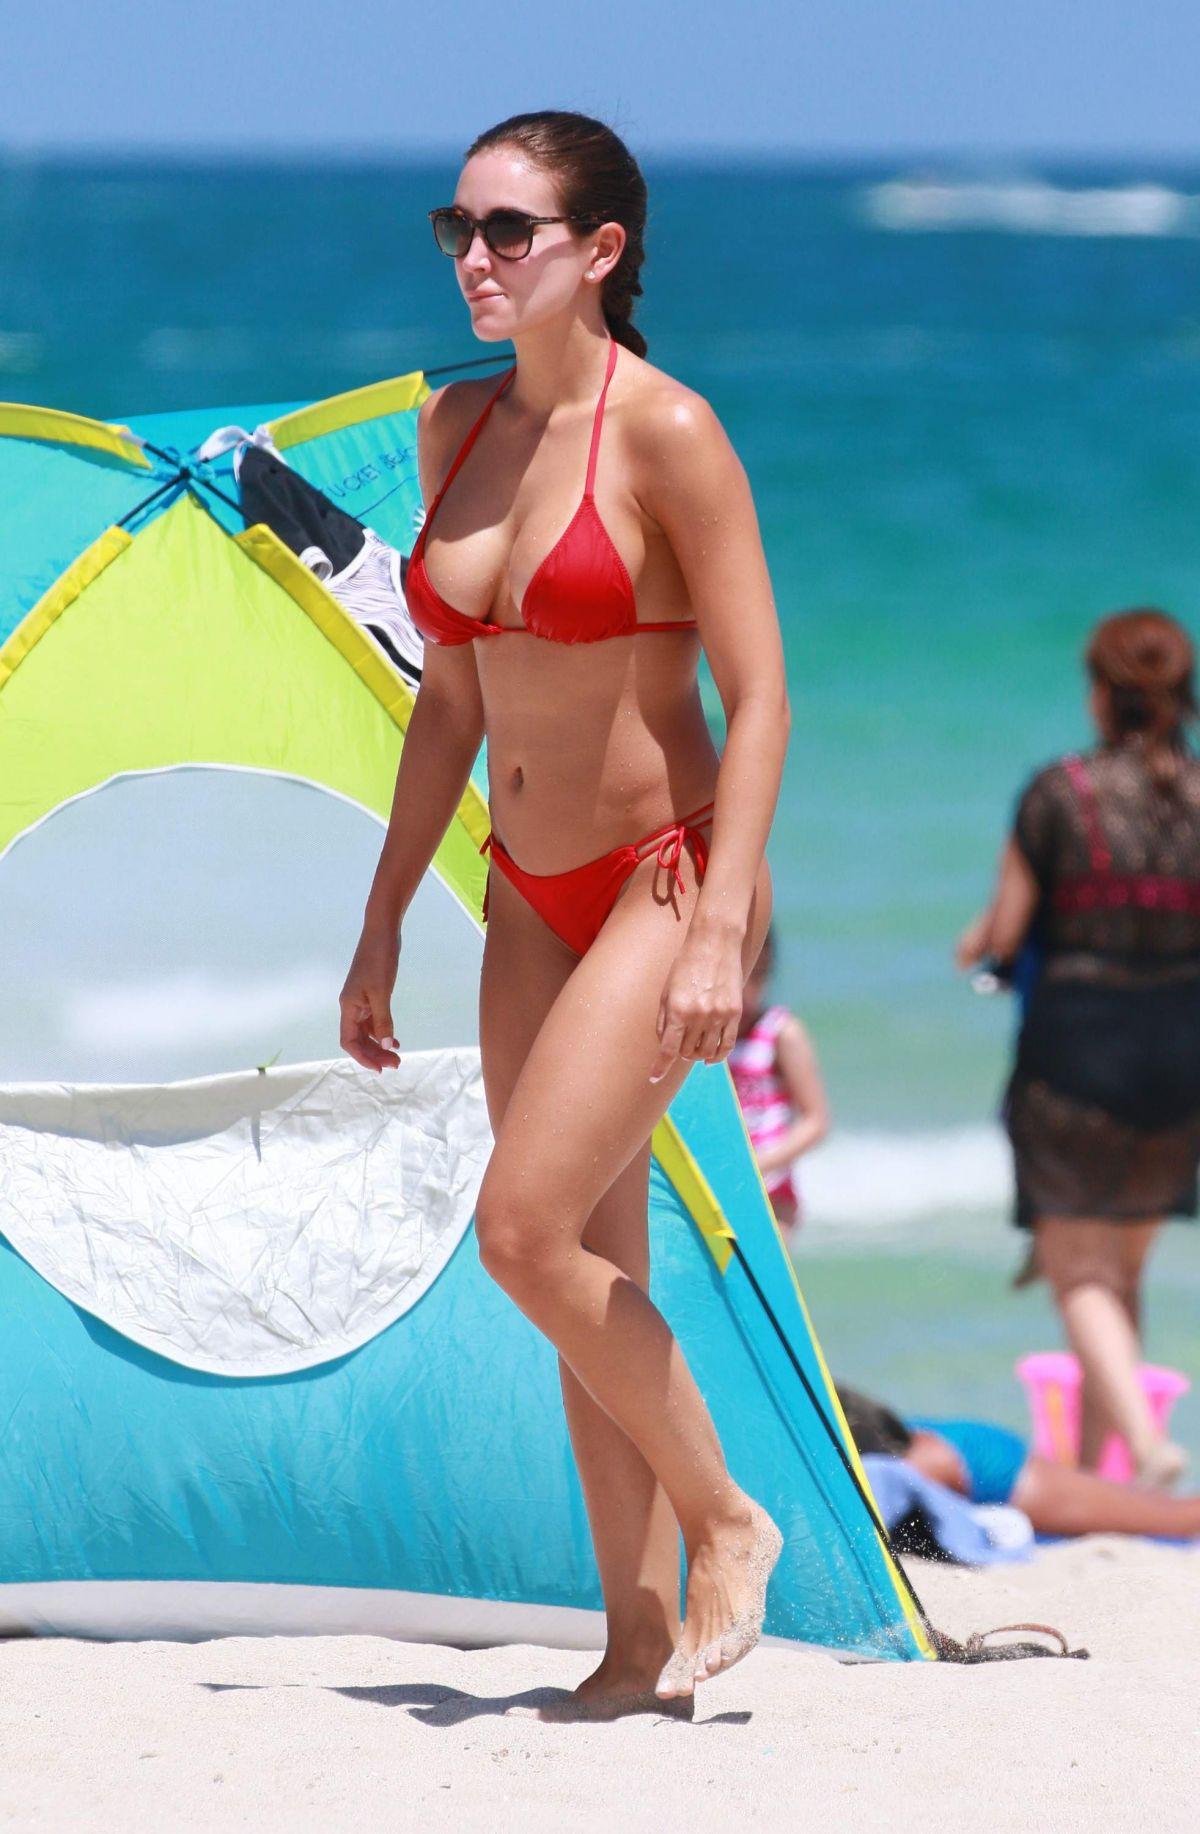 Watch Jaclyn Swedberg in Bikini - 9 Photos video